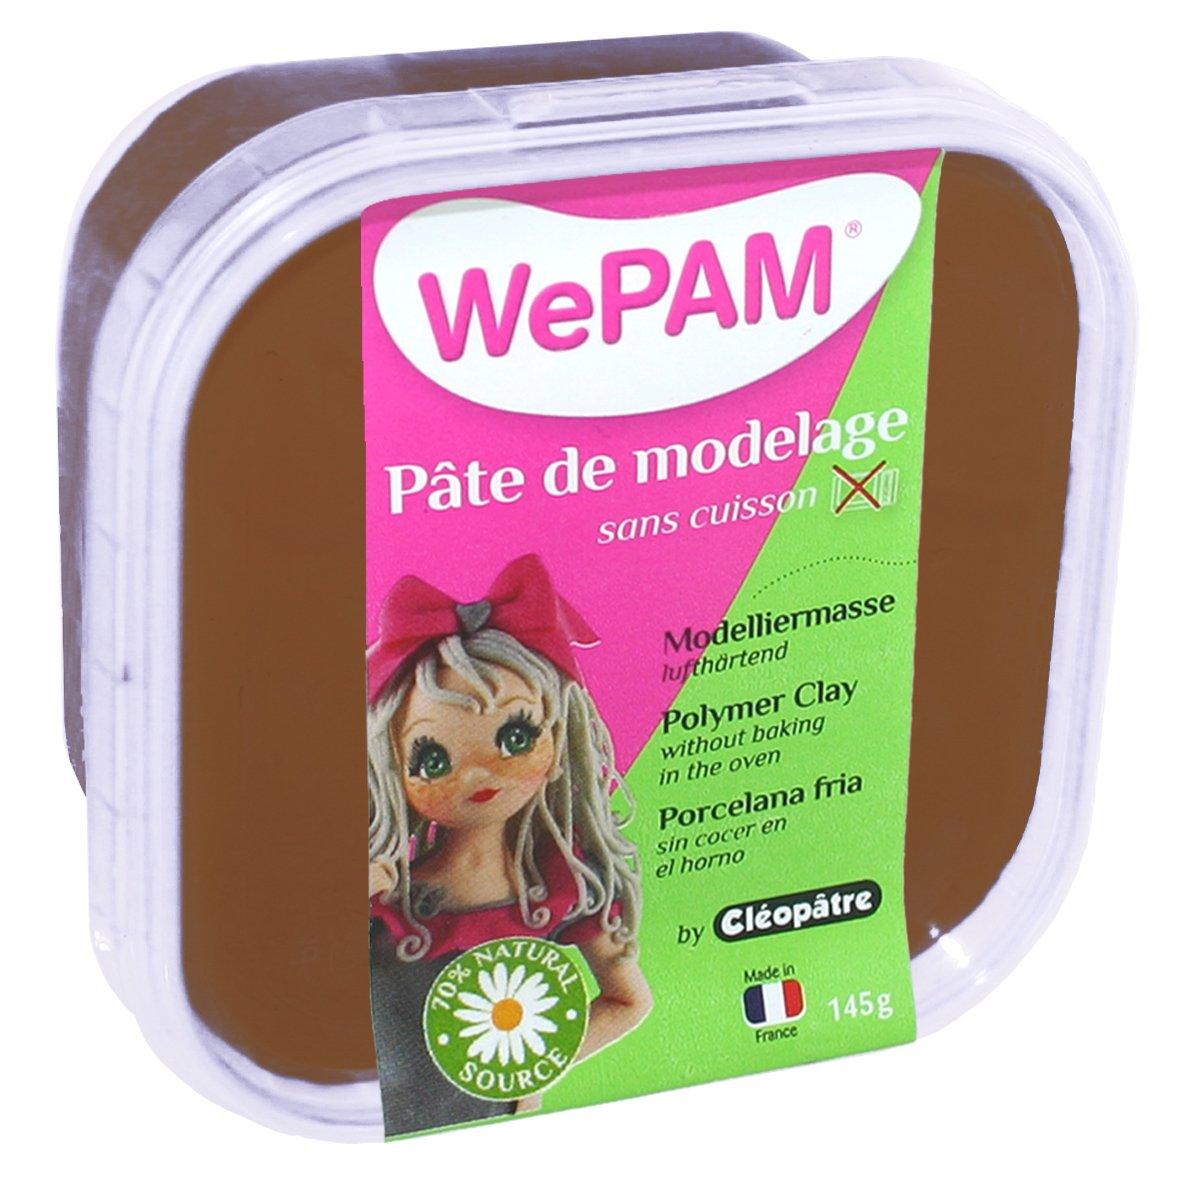 WePAM - PFW7596-145 - Pâte de modelage - Chocolat - 145 g Porcelaine à modeler